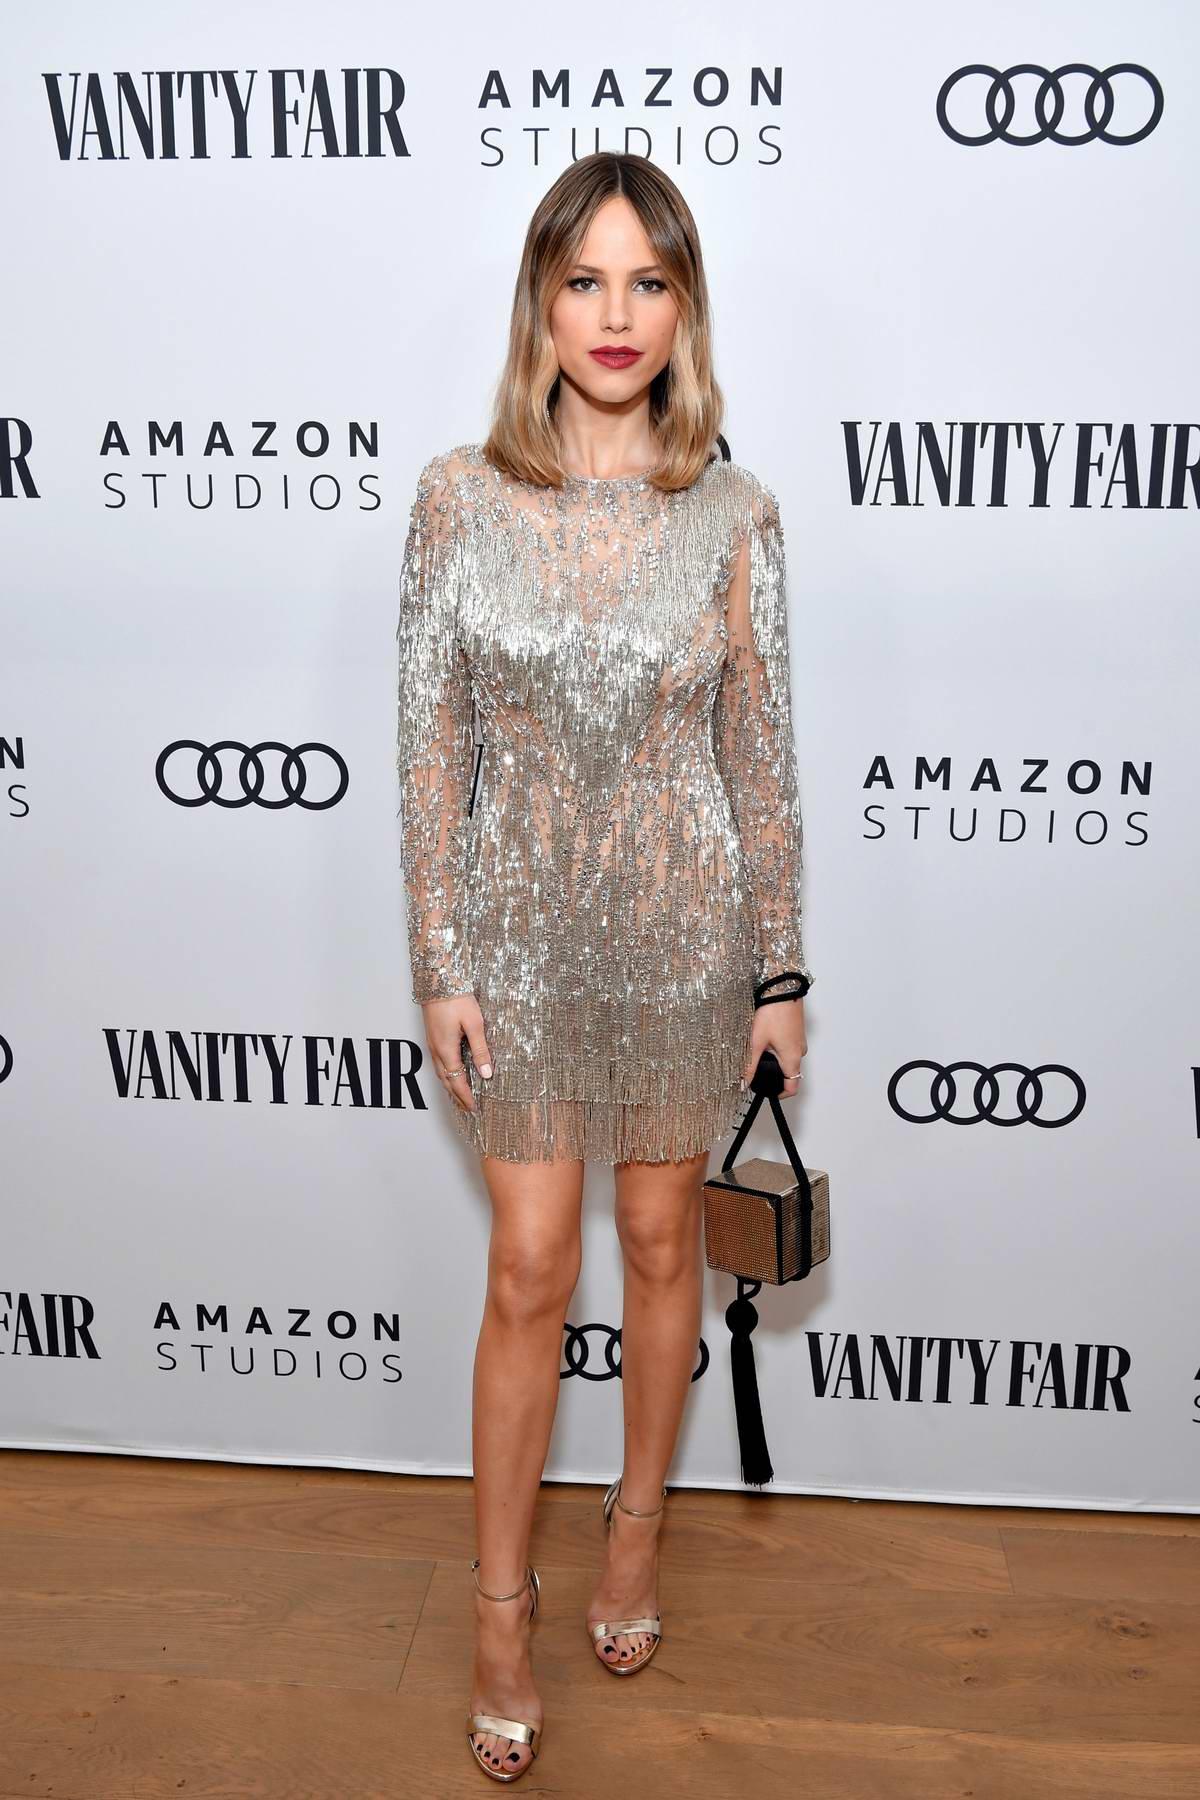 Halston Sage attends The Vanity Fair x Amazon Studios 2020 Awards Season Celebration in West Hollywood, California